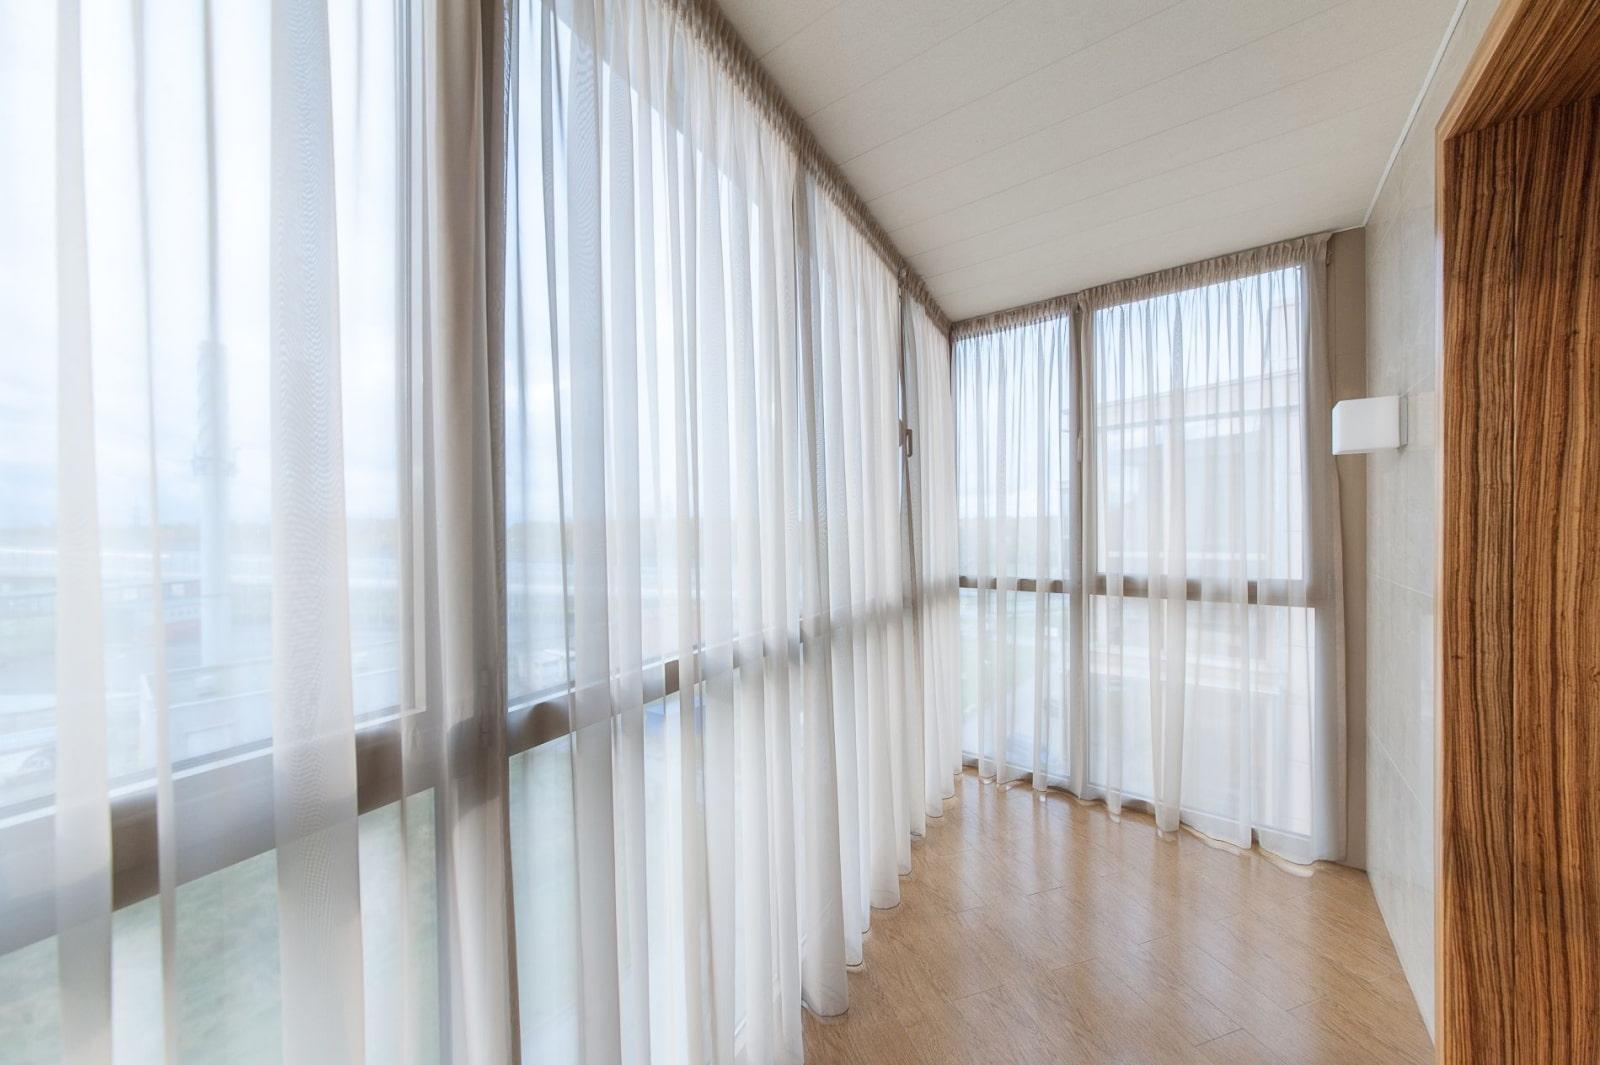 шторы на панорамные окна дизайн фото